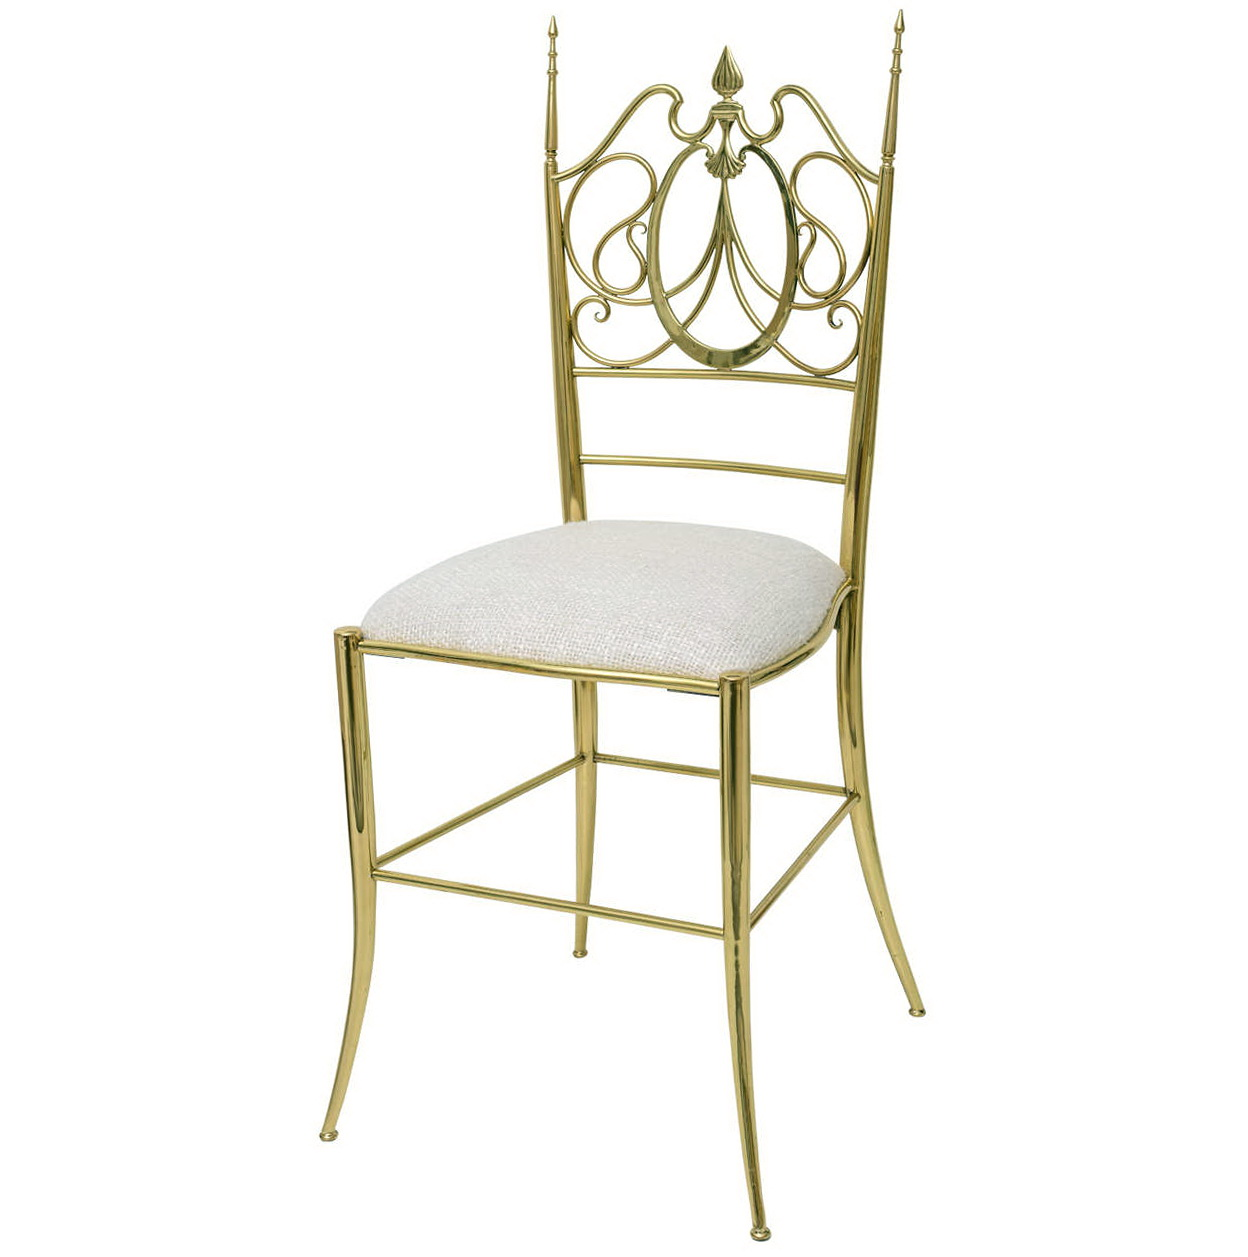 wholesale chiavari chairs for sale office chair good posture cushions home design ideas